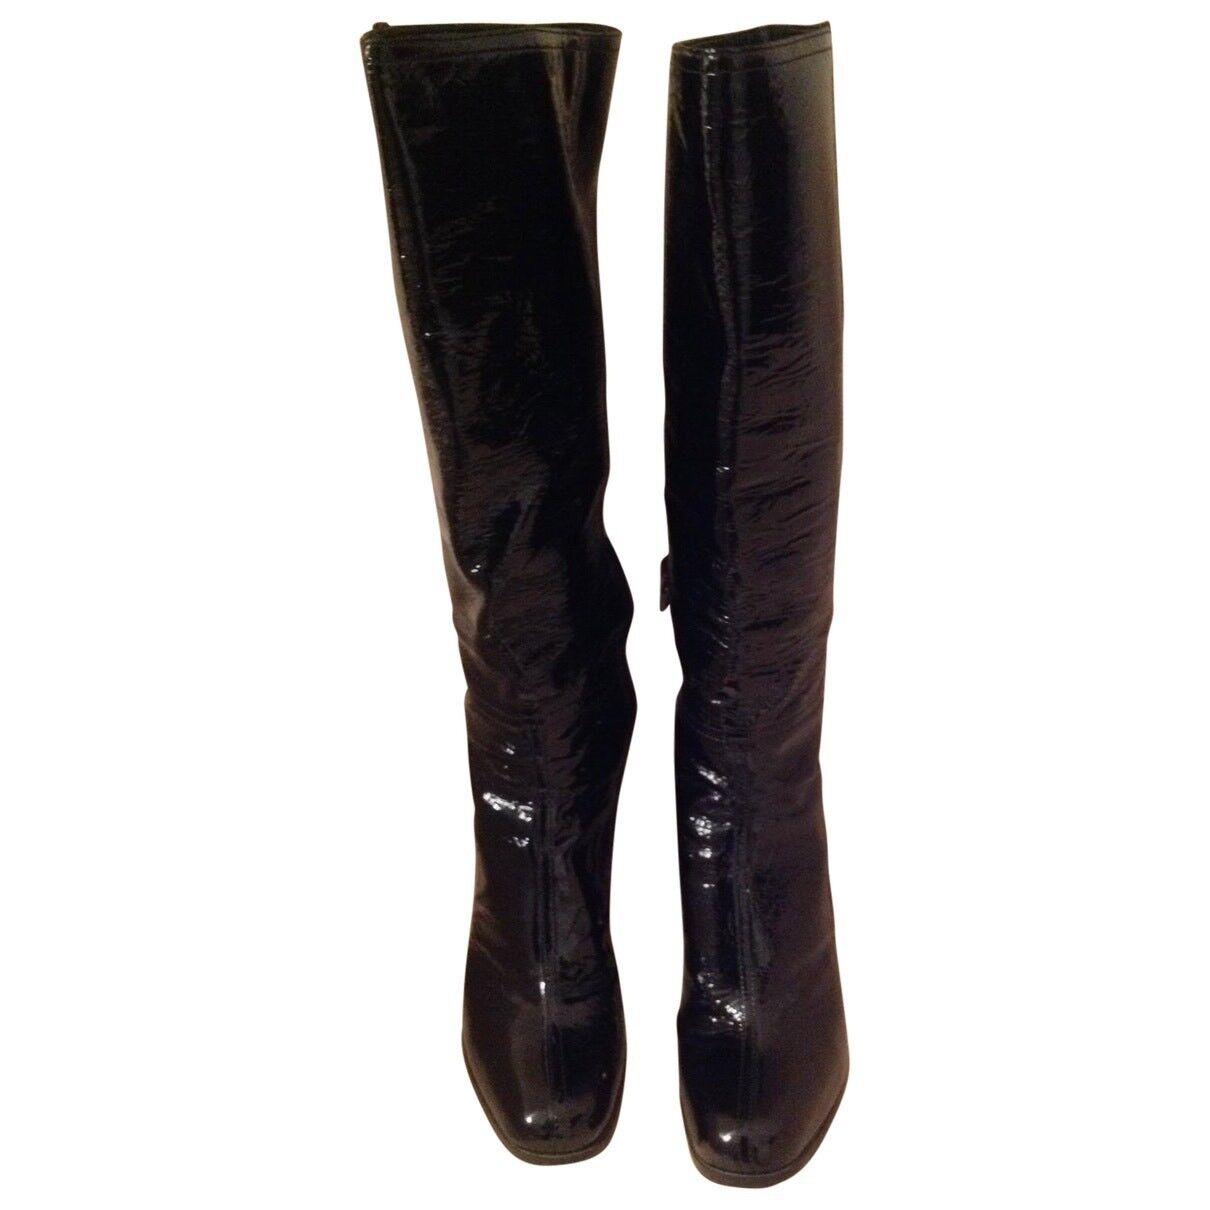 Prada Knee High Black Boot 39 Patent Leather